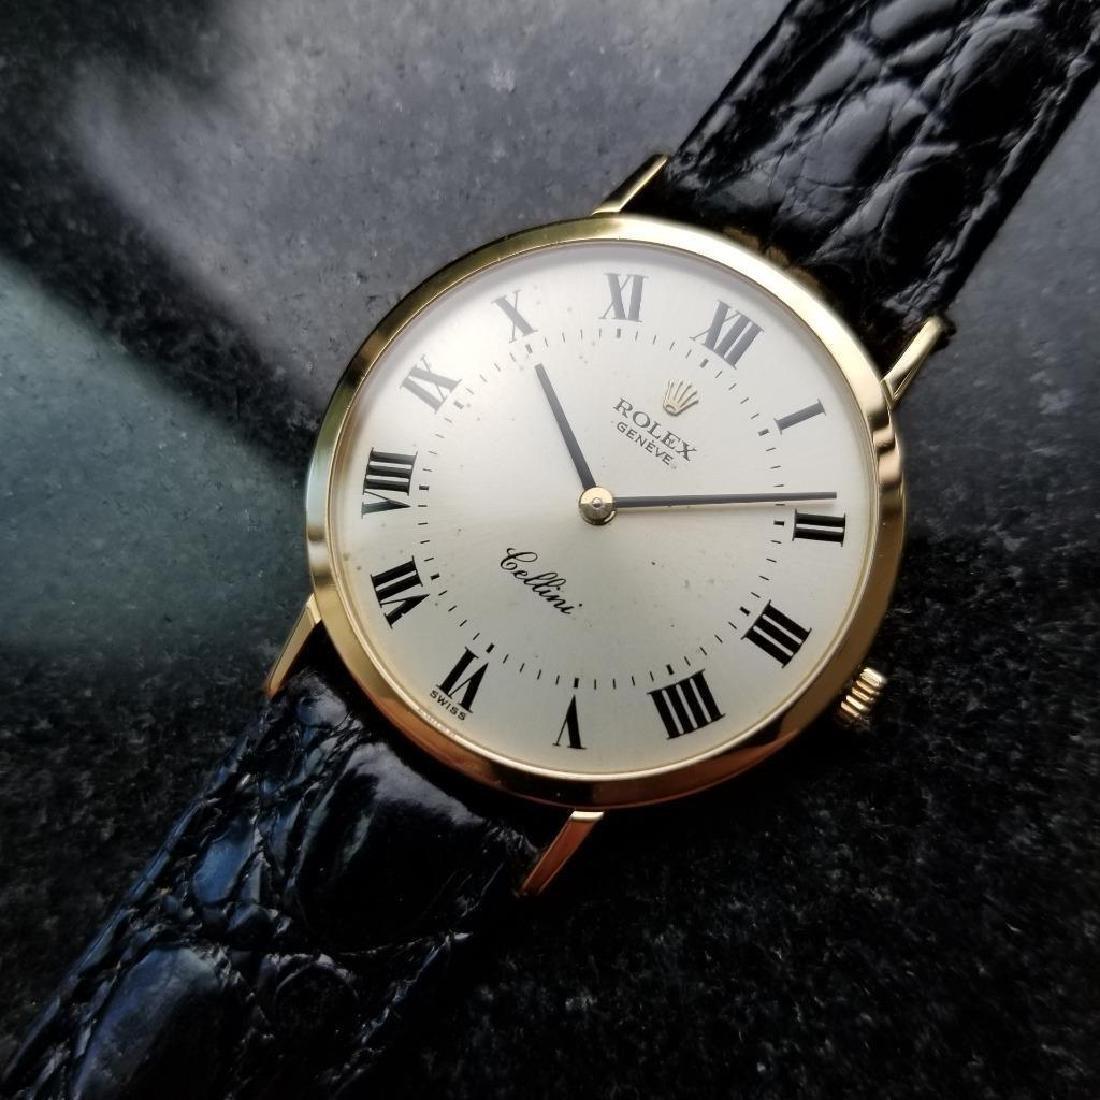 Rolex Cellini 18K Solid Gold 1981 Mens Swiss Watch